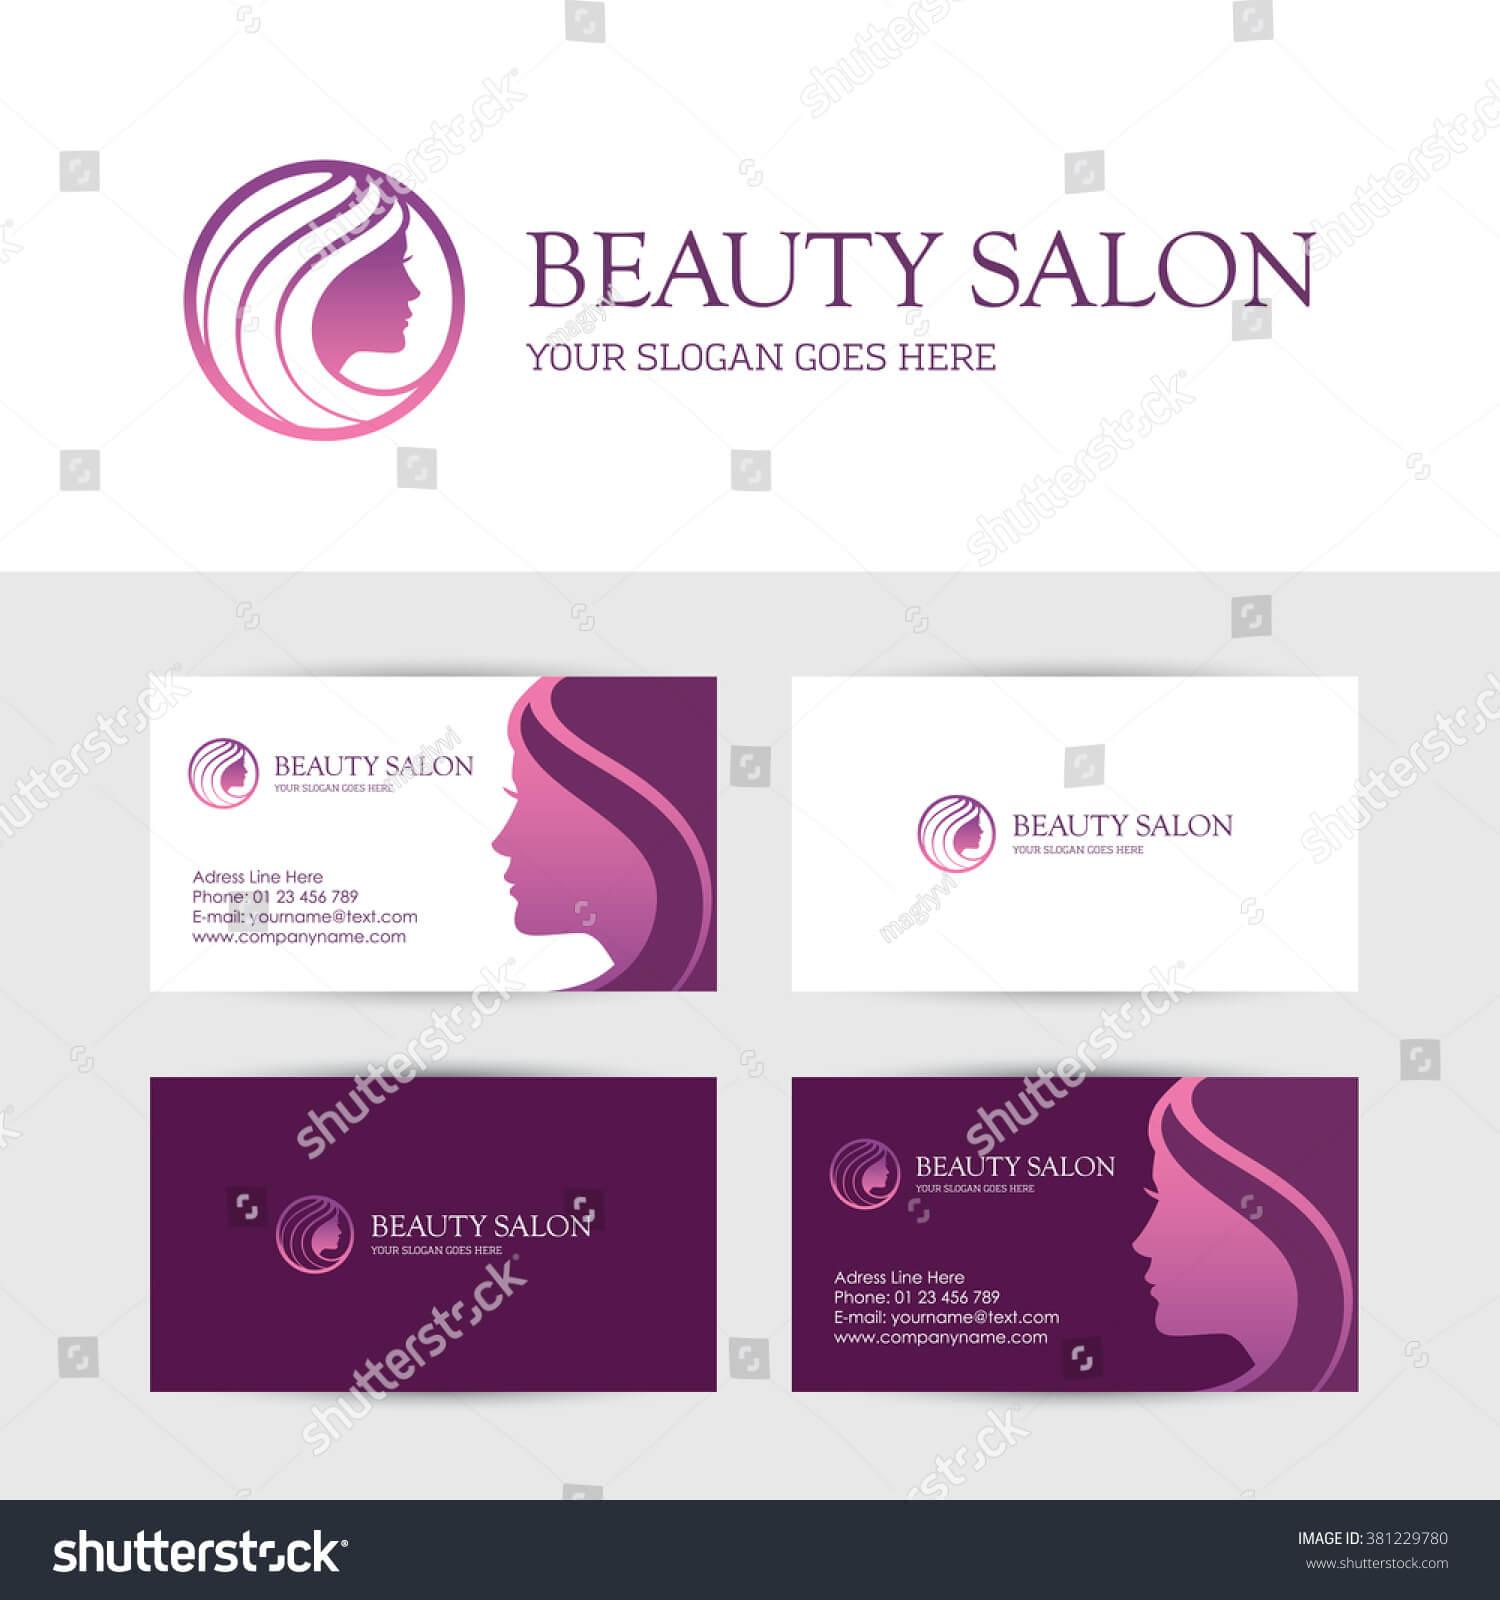 Logo Business Card Design Templates Beauty | Royalty Free Inside Hair Salon Business Card Template